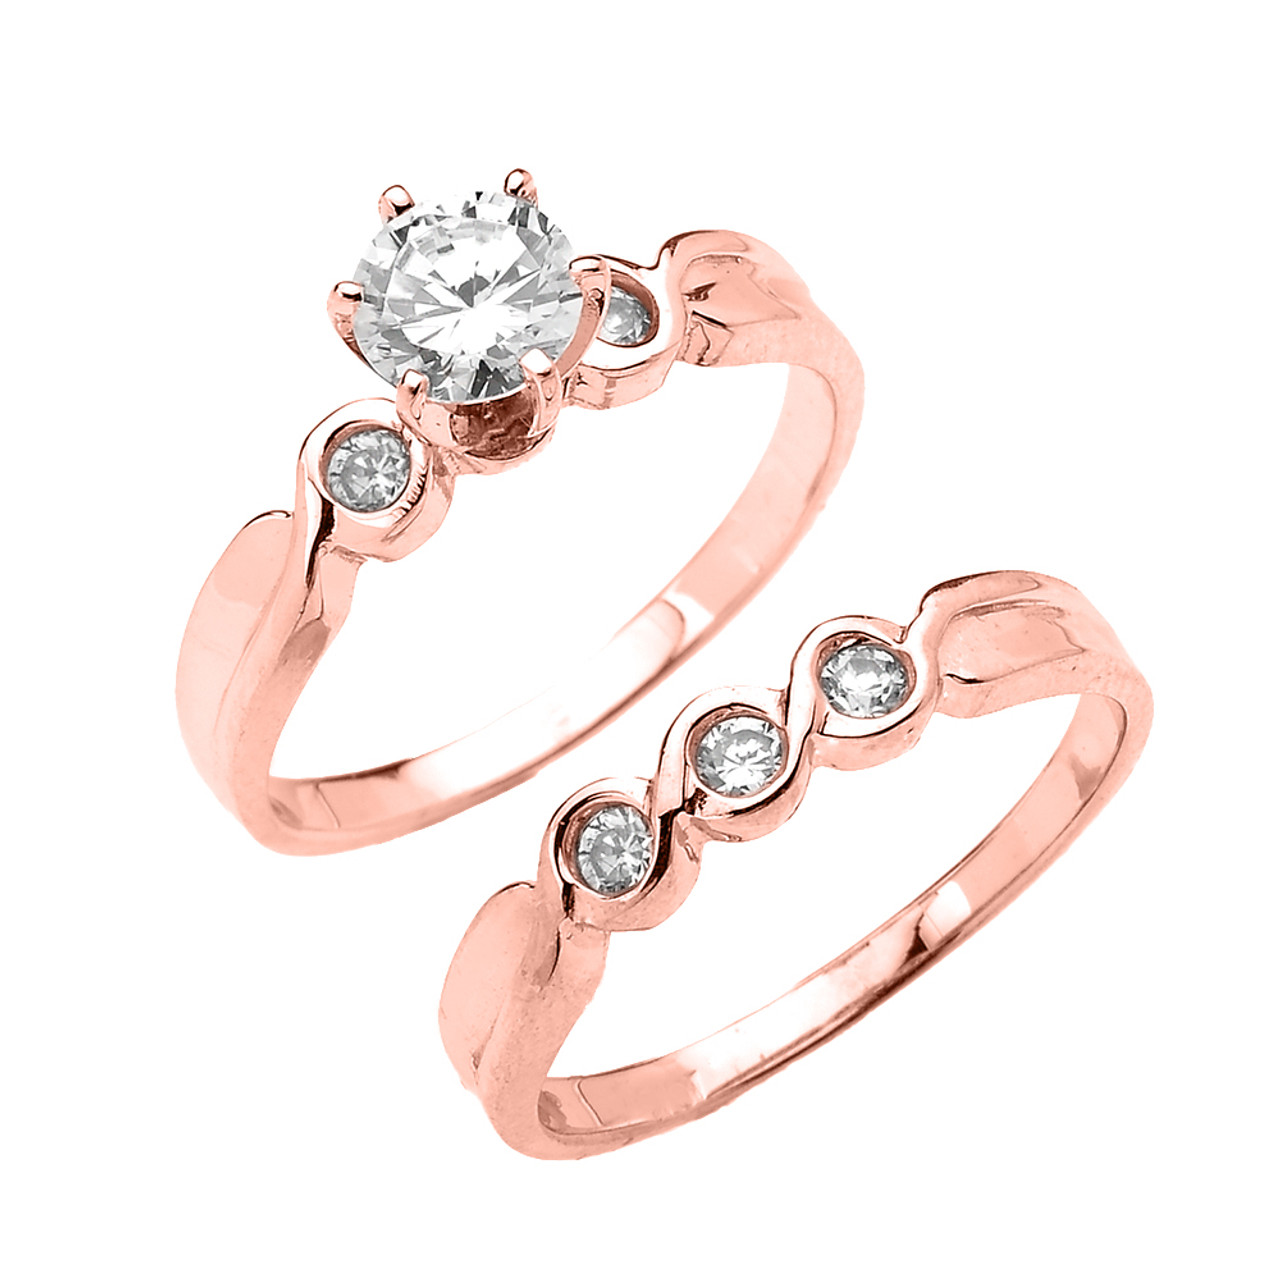 Rose Gold 6 Prongs Cubic Zirconia 2pc Engagement Wedding Ring Set: 2 Pc Wedding Ring Sets At Reisefeber.org